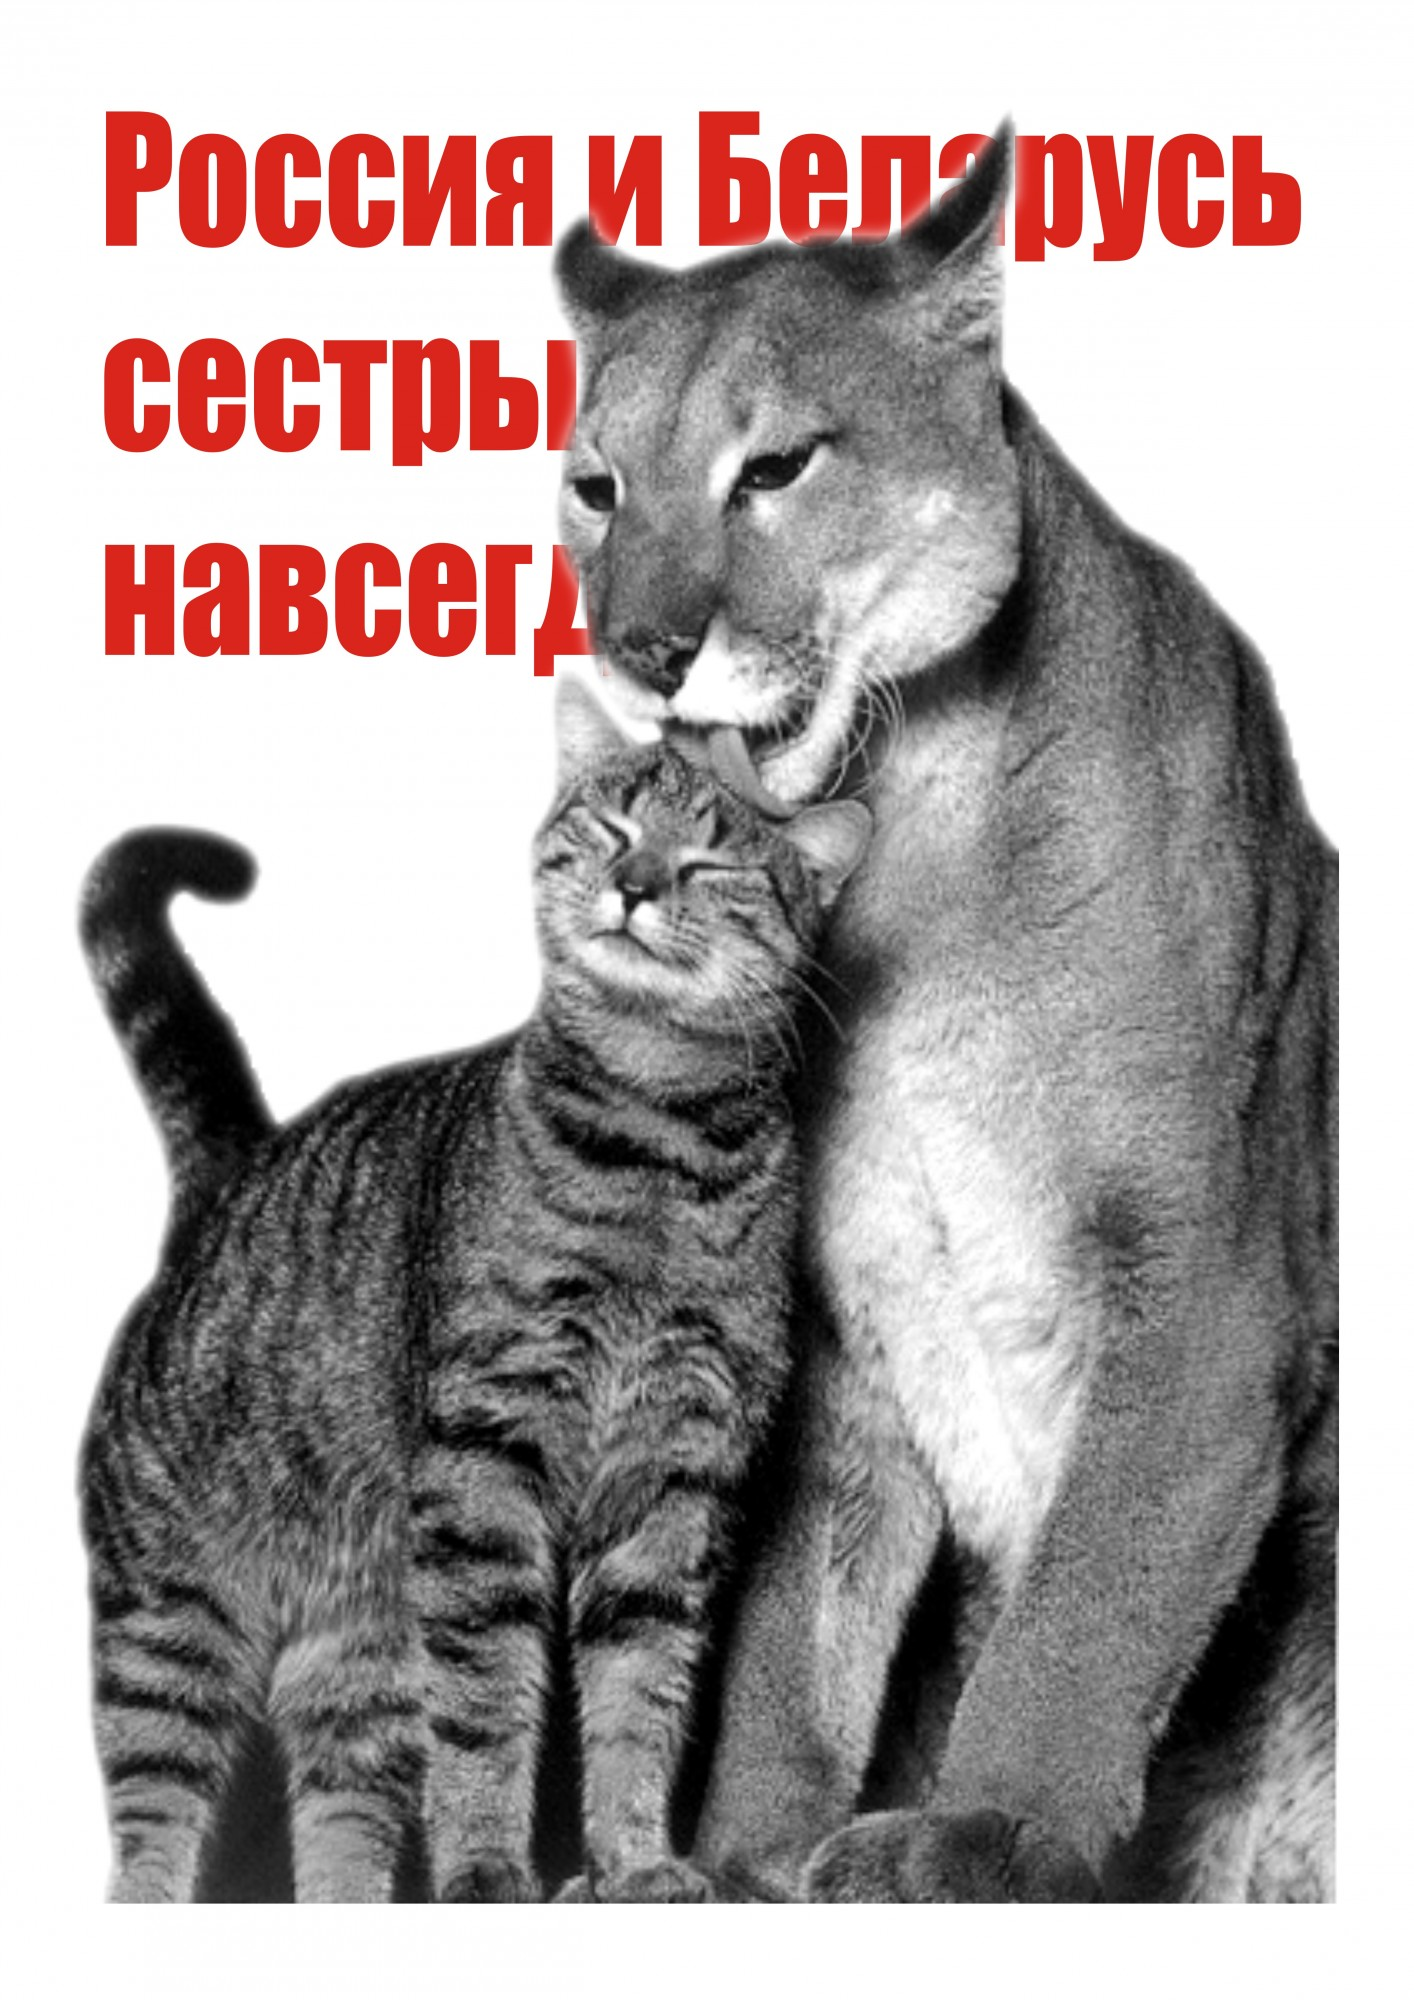 Автор плаката - Олег Фролов (Волорф)